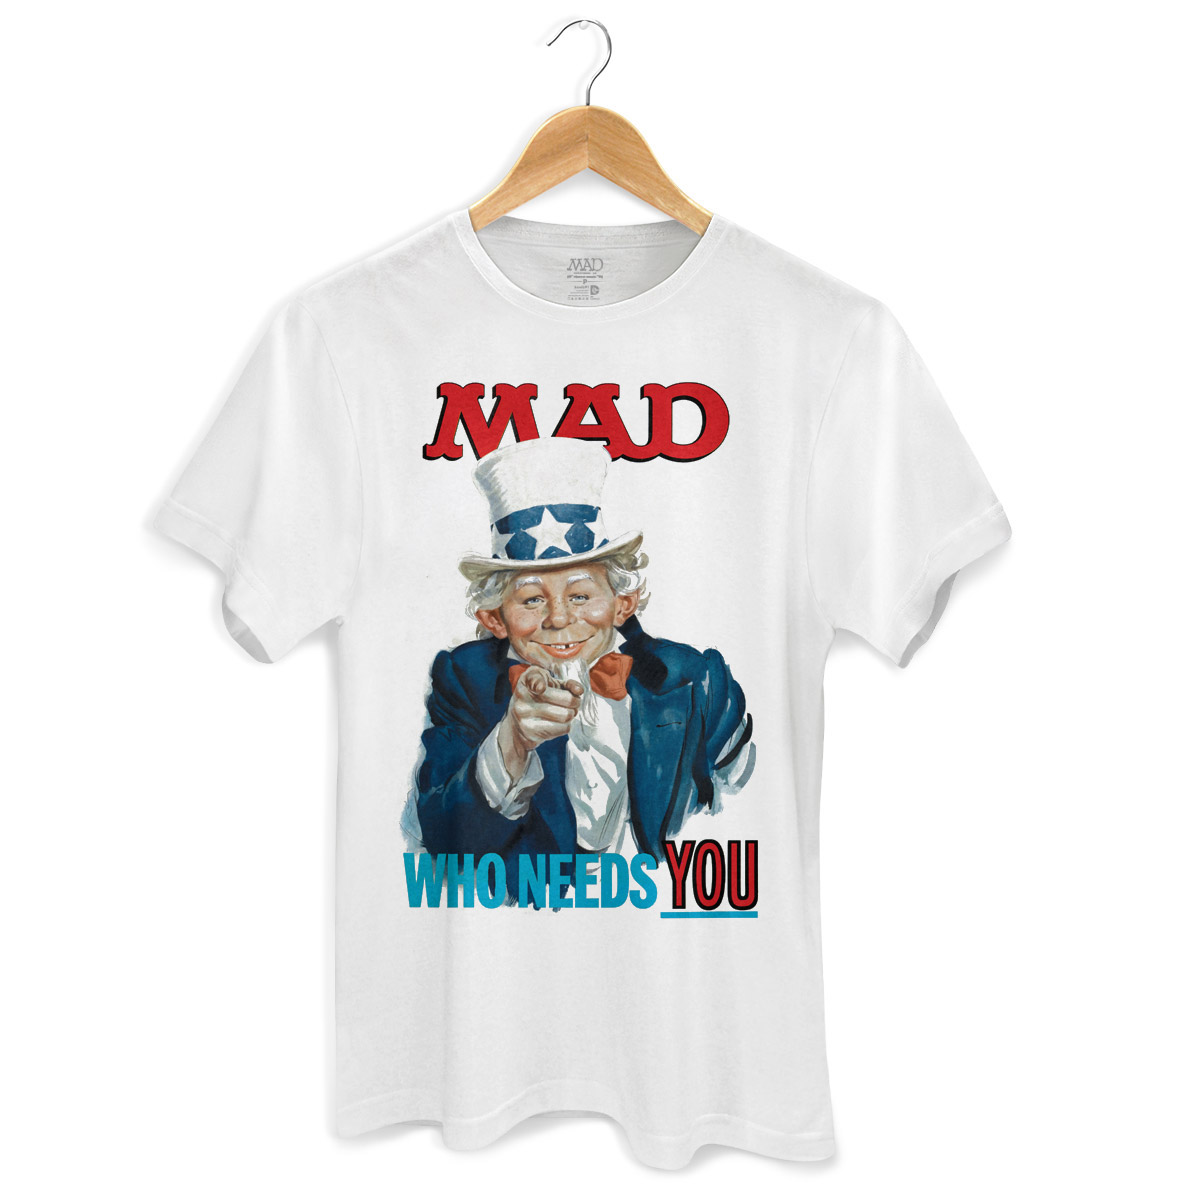 Camiseta Masculina MAD Who Needs You?